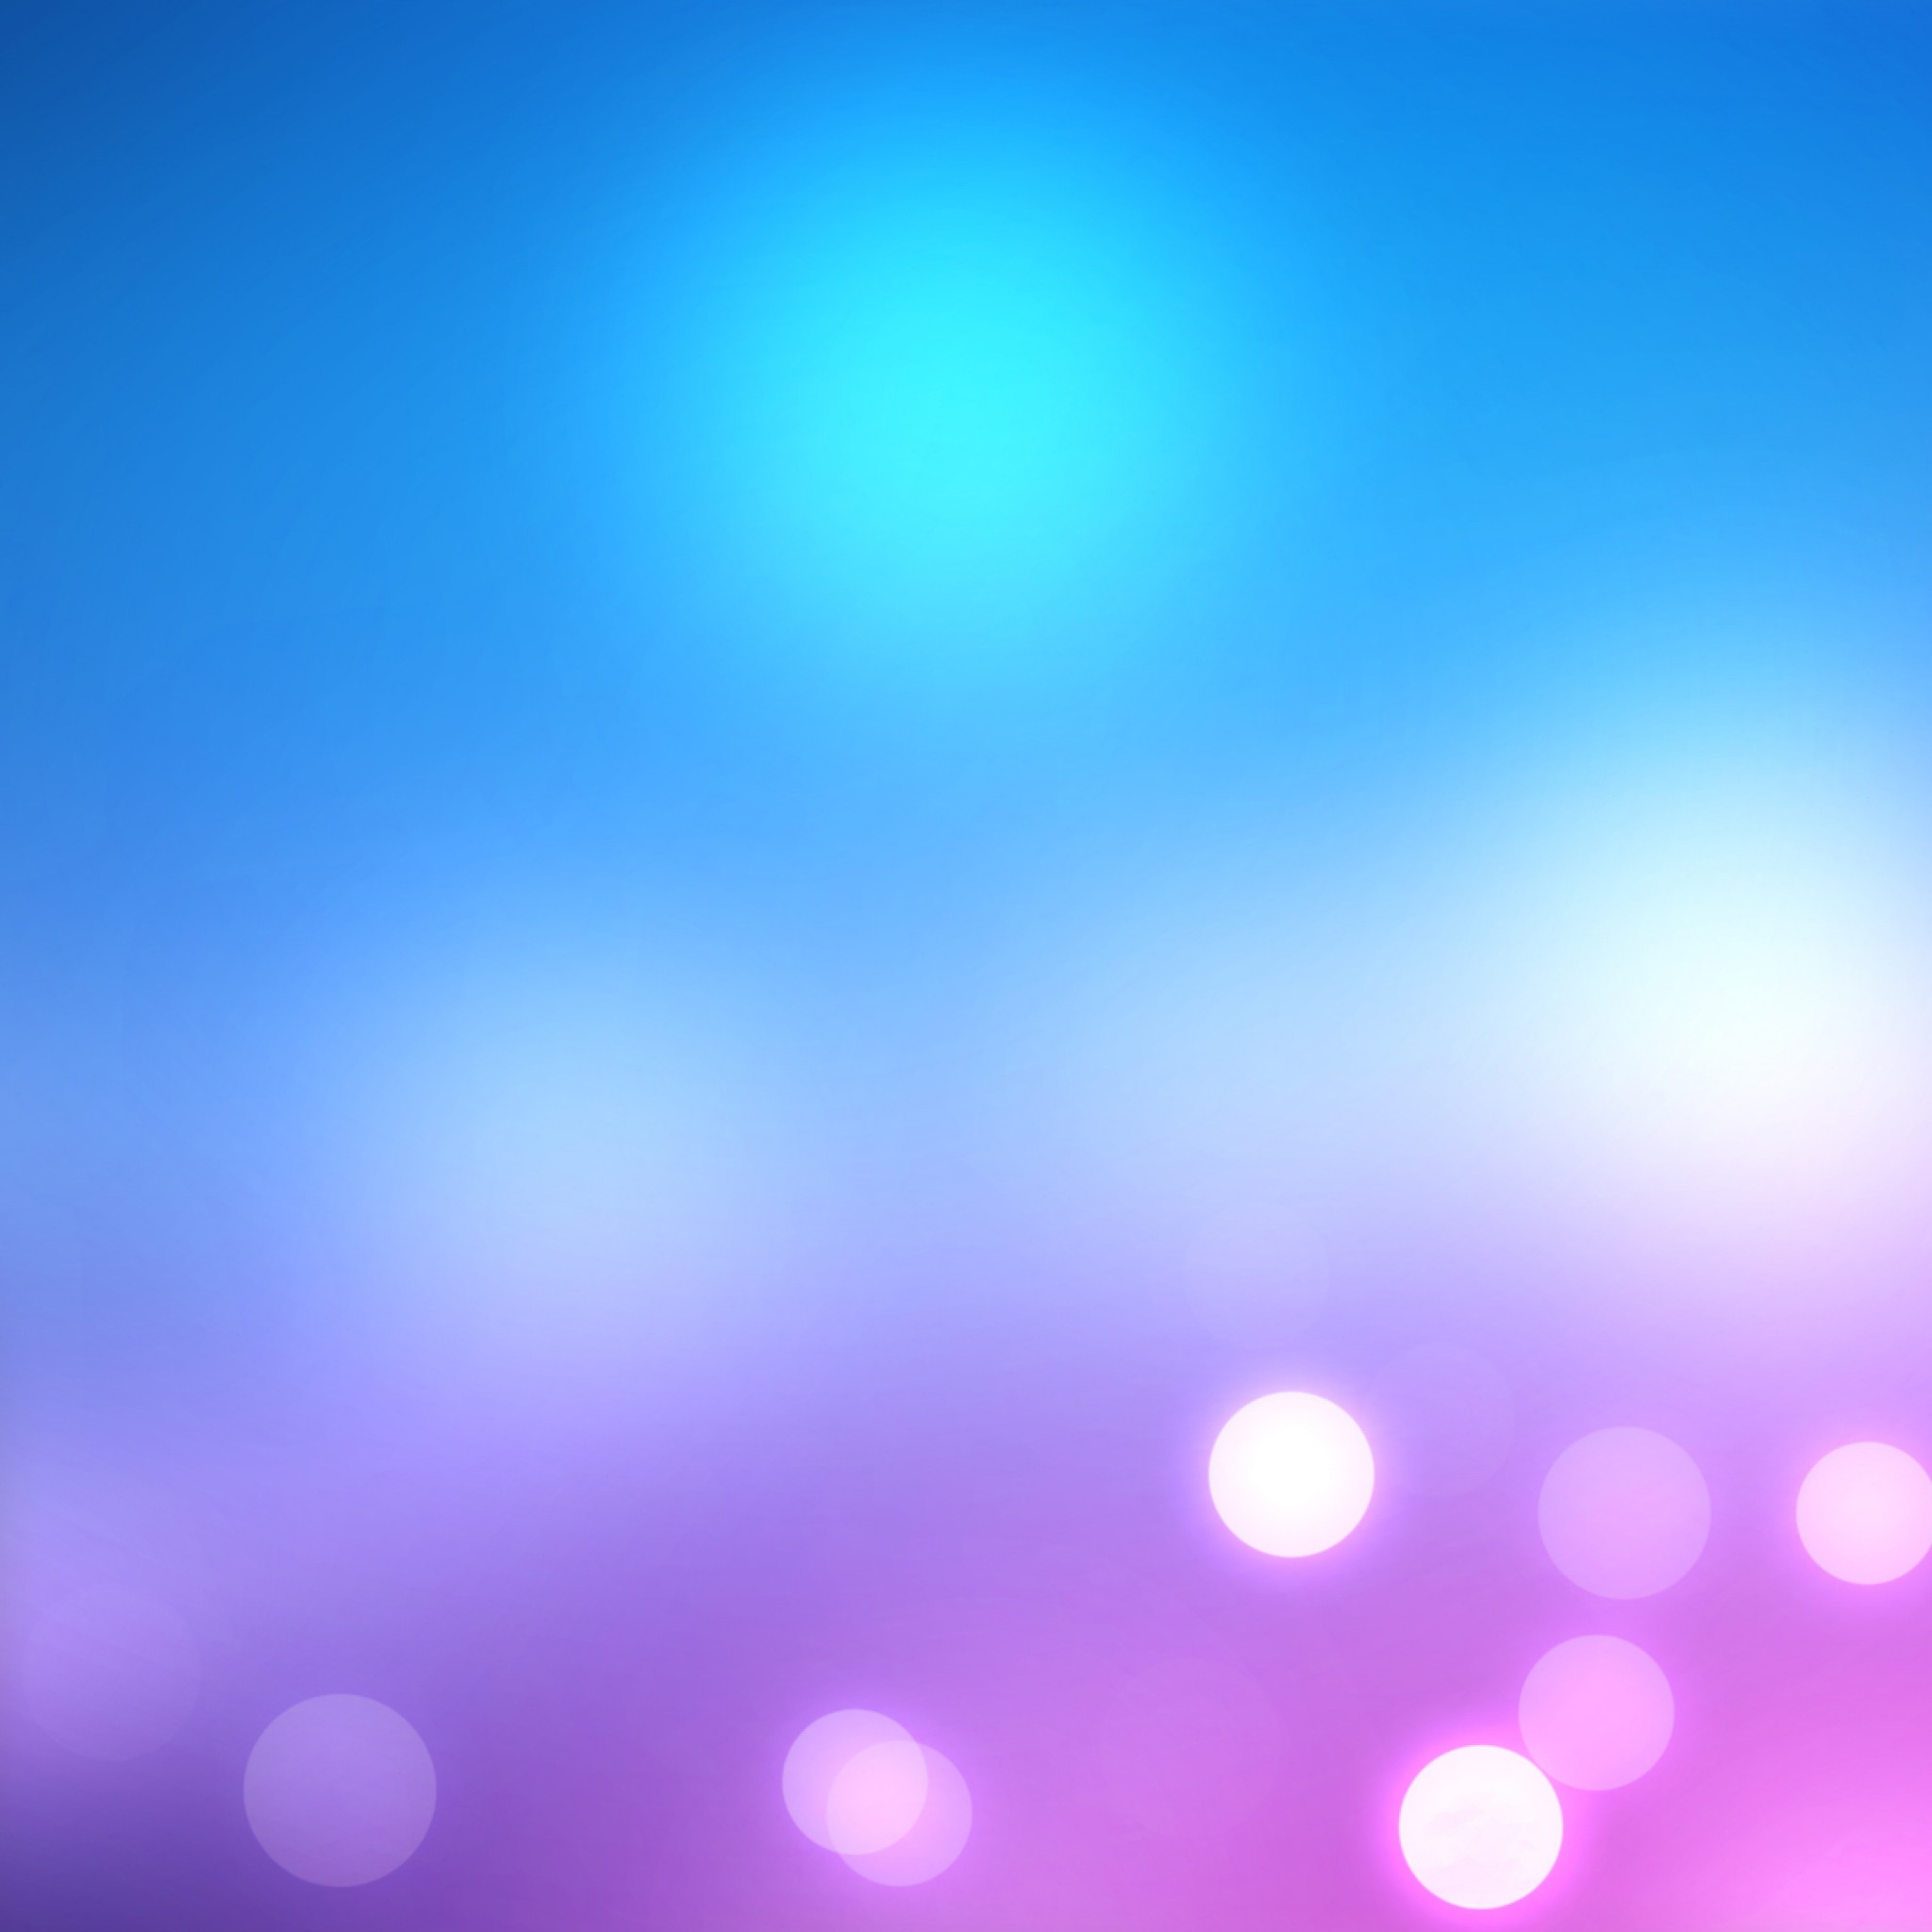 Bubble Purple Ipad Retina Wallpaper For Iphone X 8 7